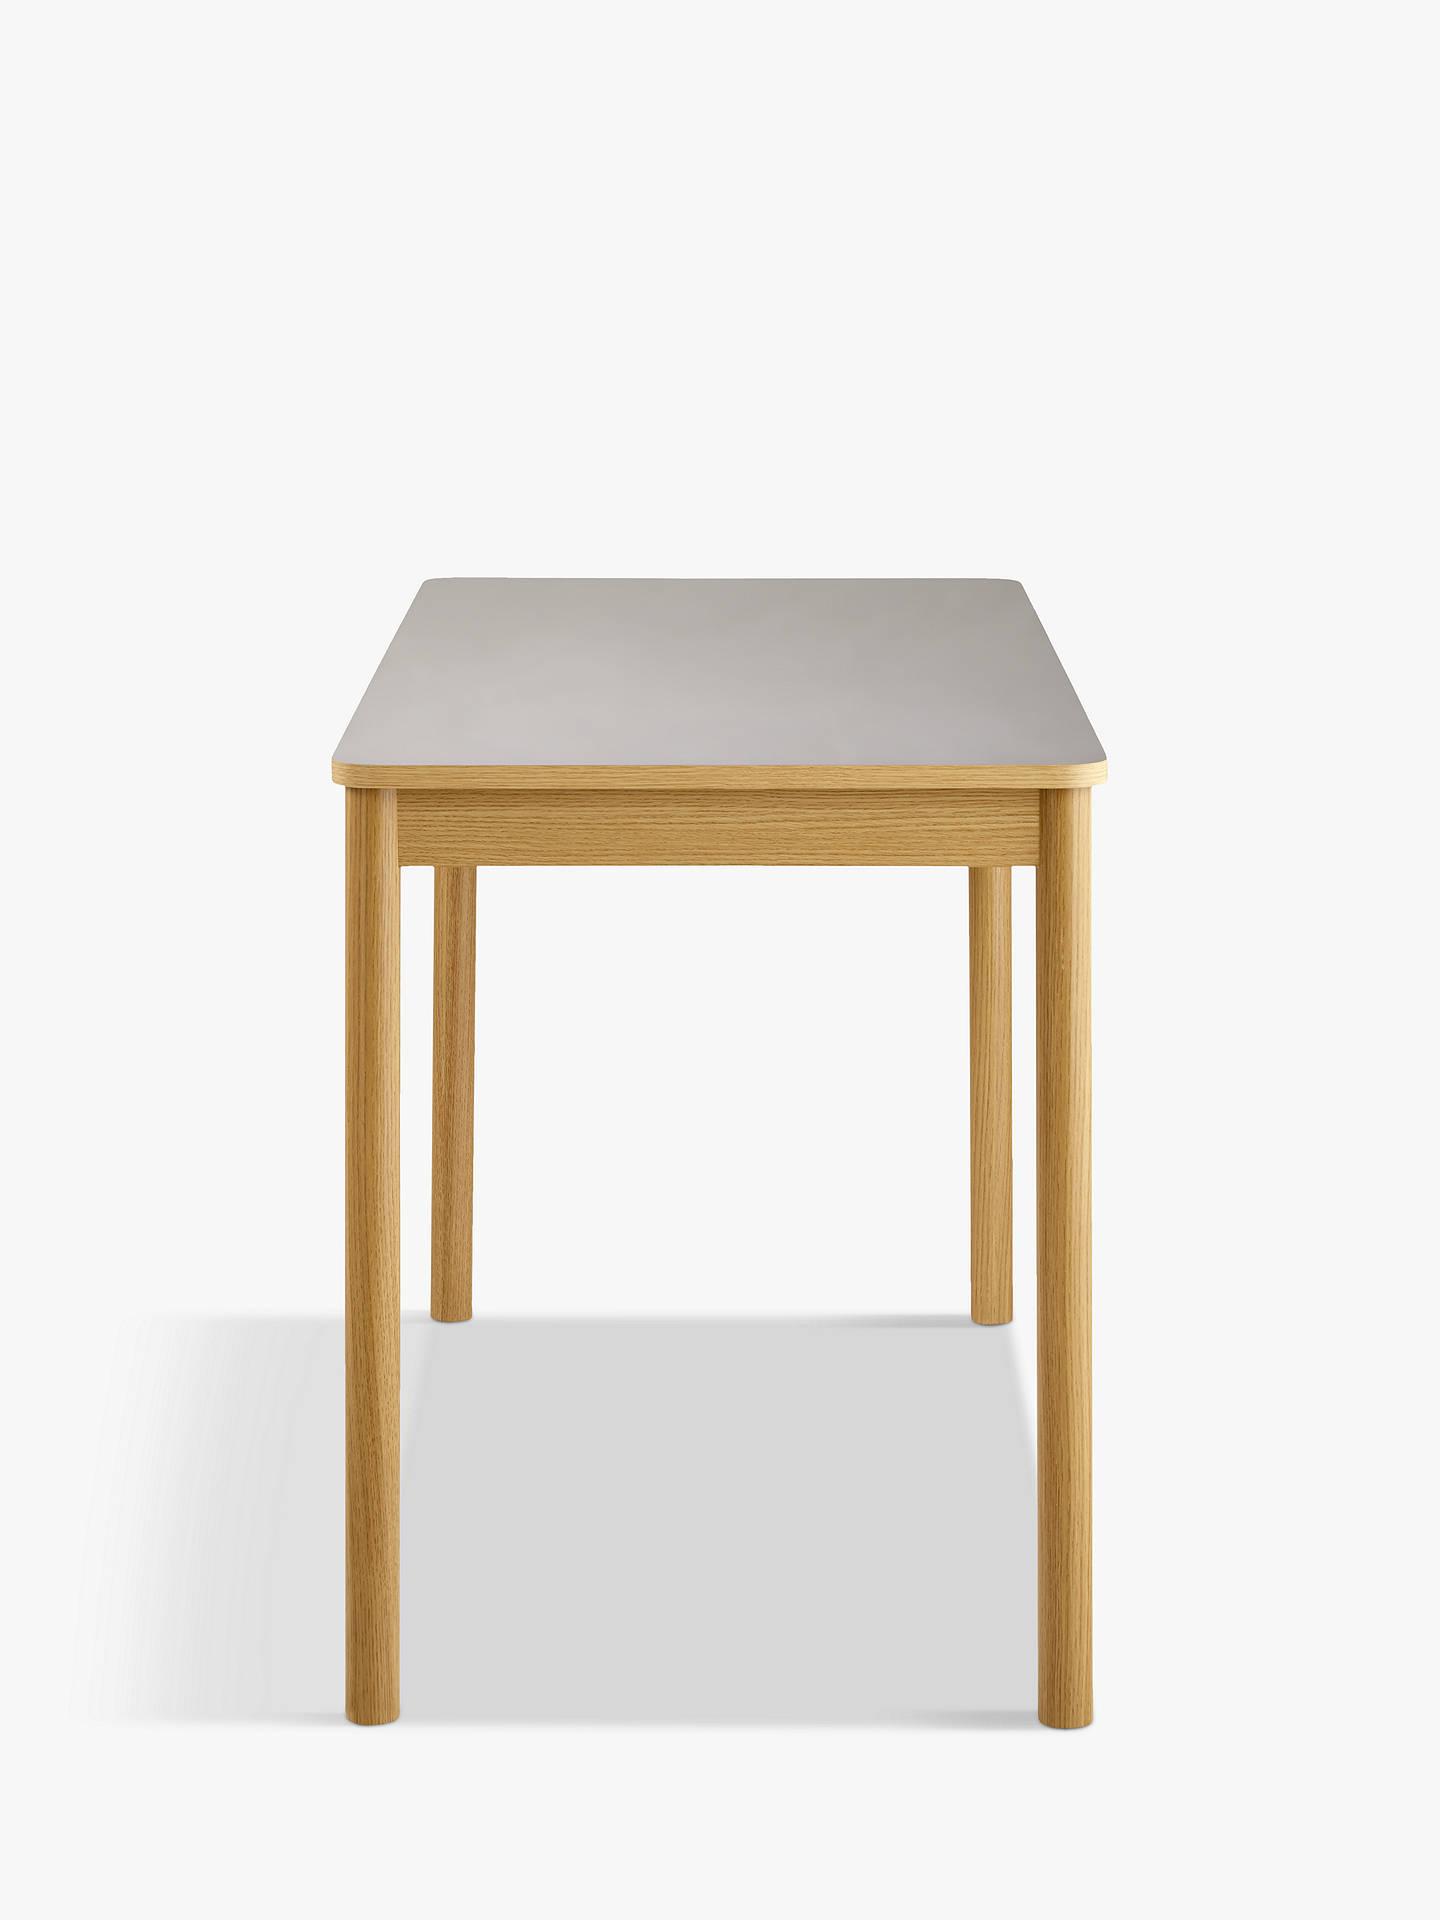 Astonishing John Lewis Partners Peyton 4 Seater Kitchen Dining Table Theyellowbook Wood Chair Design Ideas Theyellowbookinfo